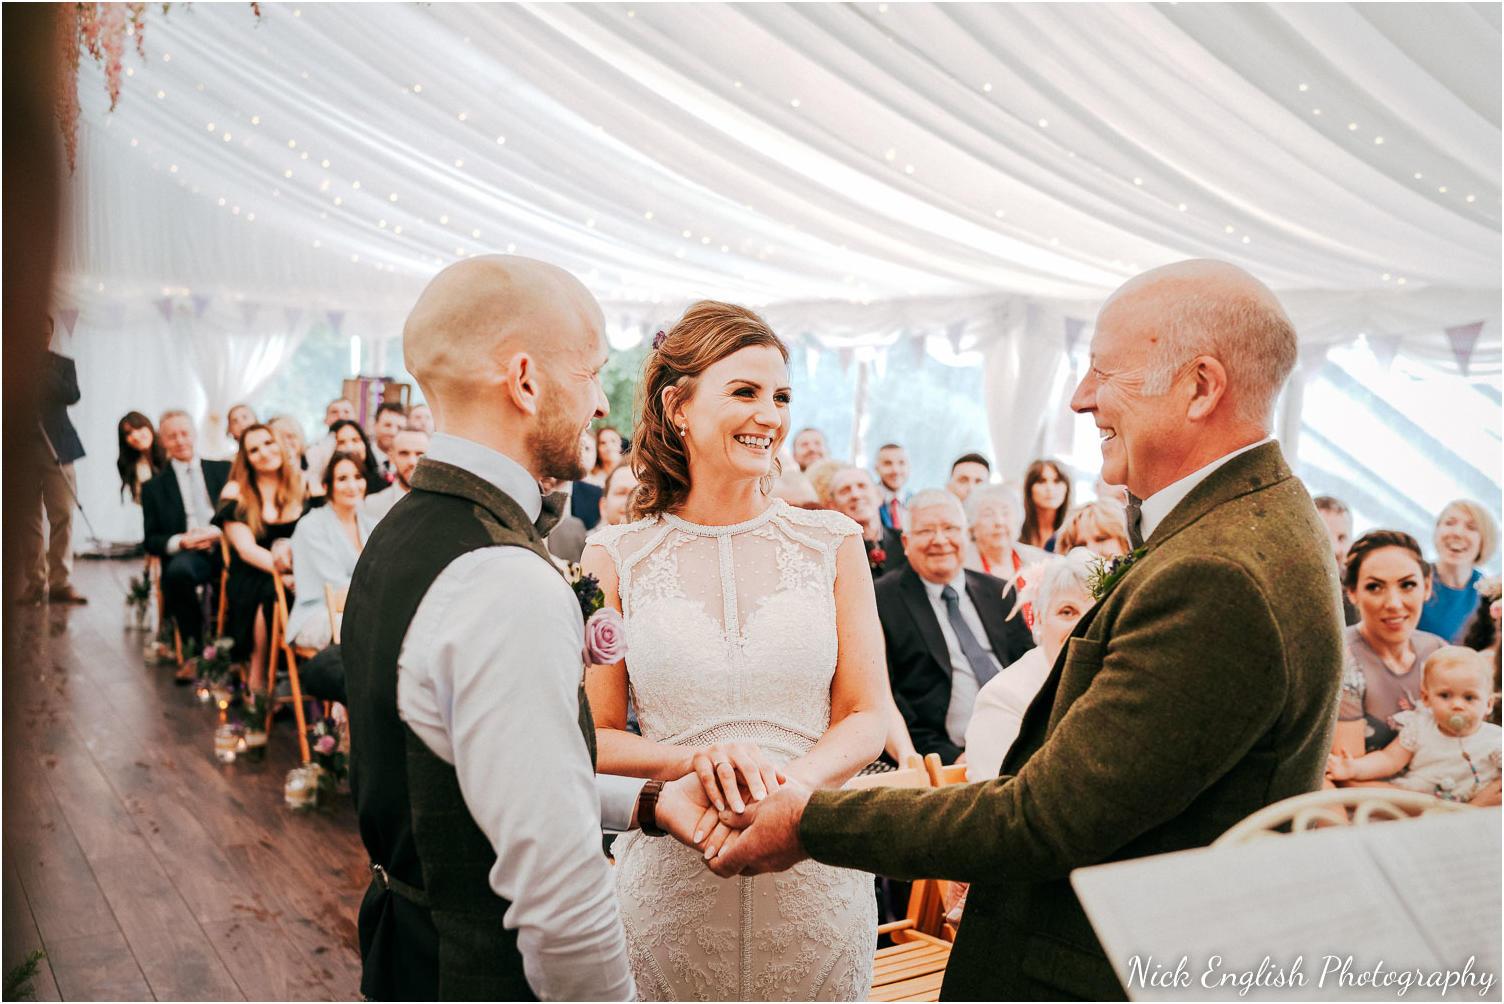 Spring_Cottage_Rivington_Lancashire_Wedding_Photographs-61.jpg